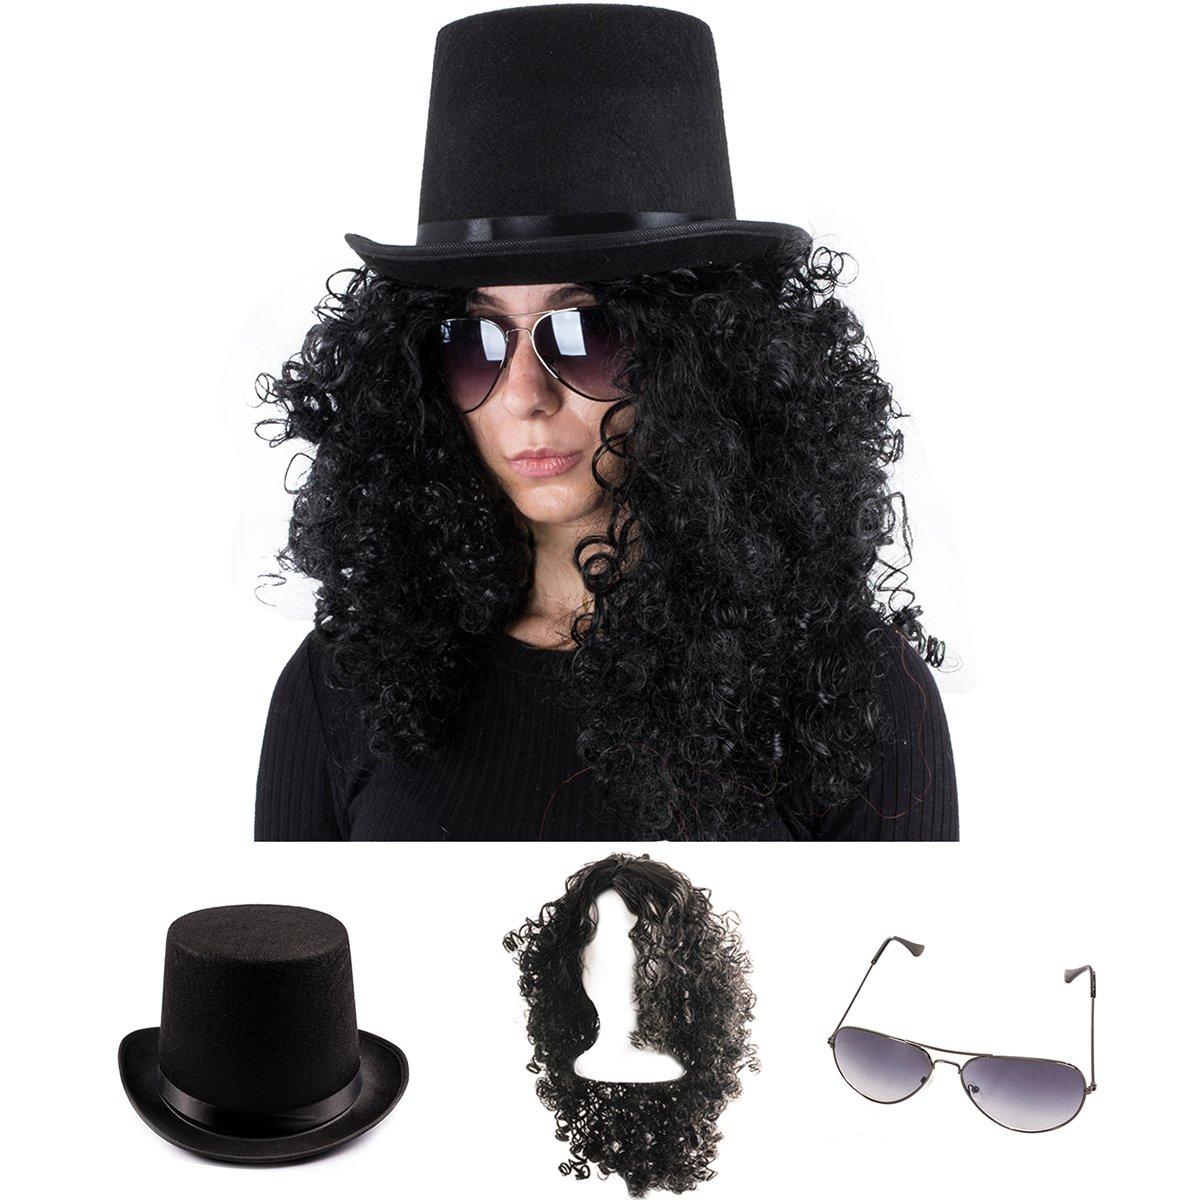 Tigerdoe Rockstar Costume - 80s Costumes for Men - Heavy Metal Wig - (3 Pc Set) by (Black Wig, Top Hat, Aviators)